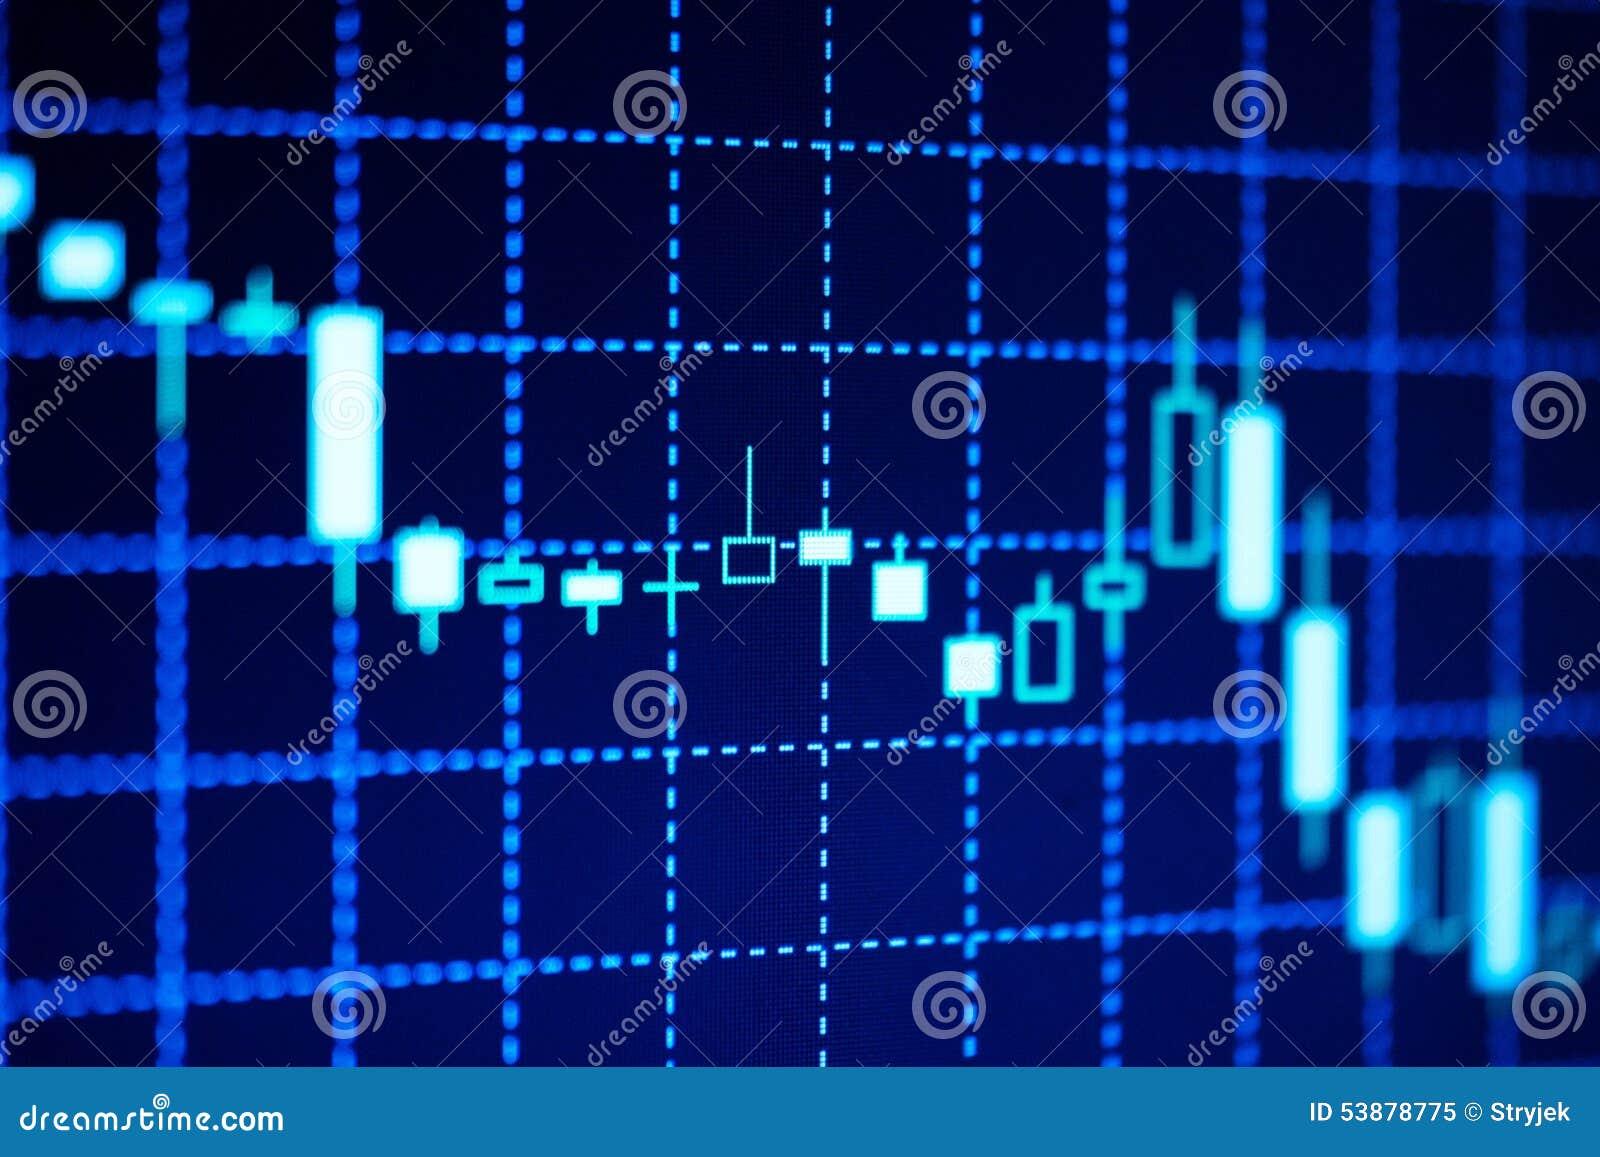 Candlestick chart showing a decreasing trend